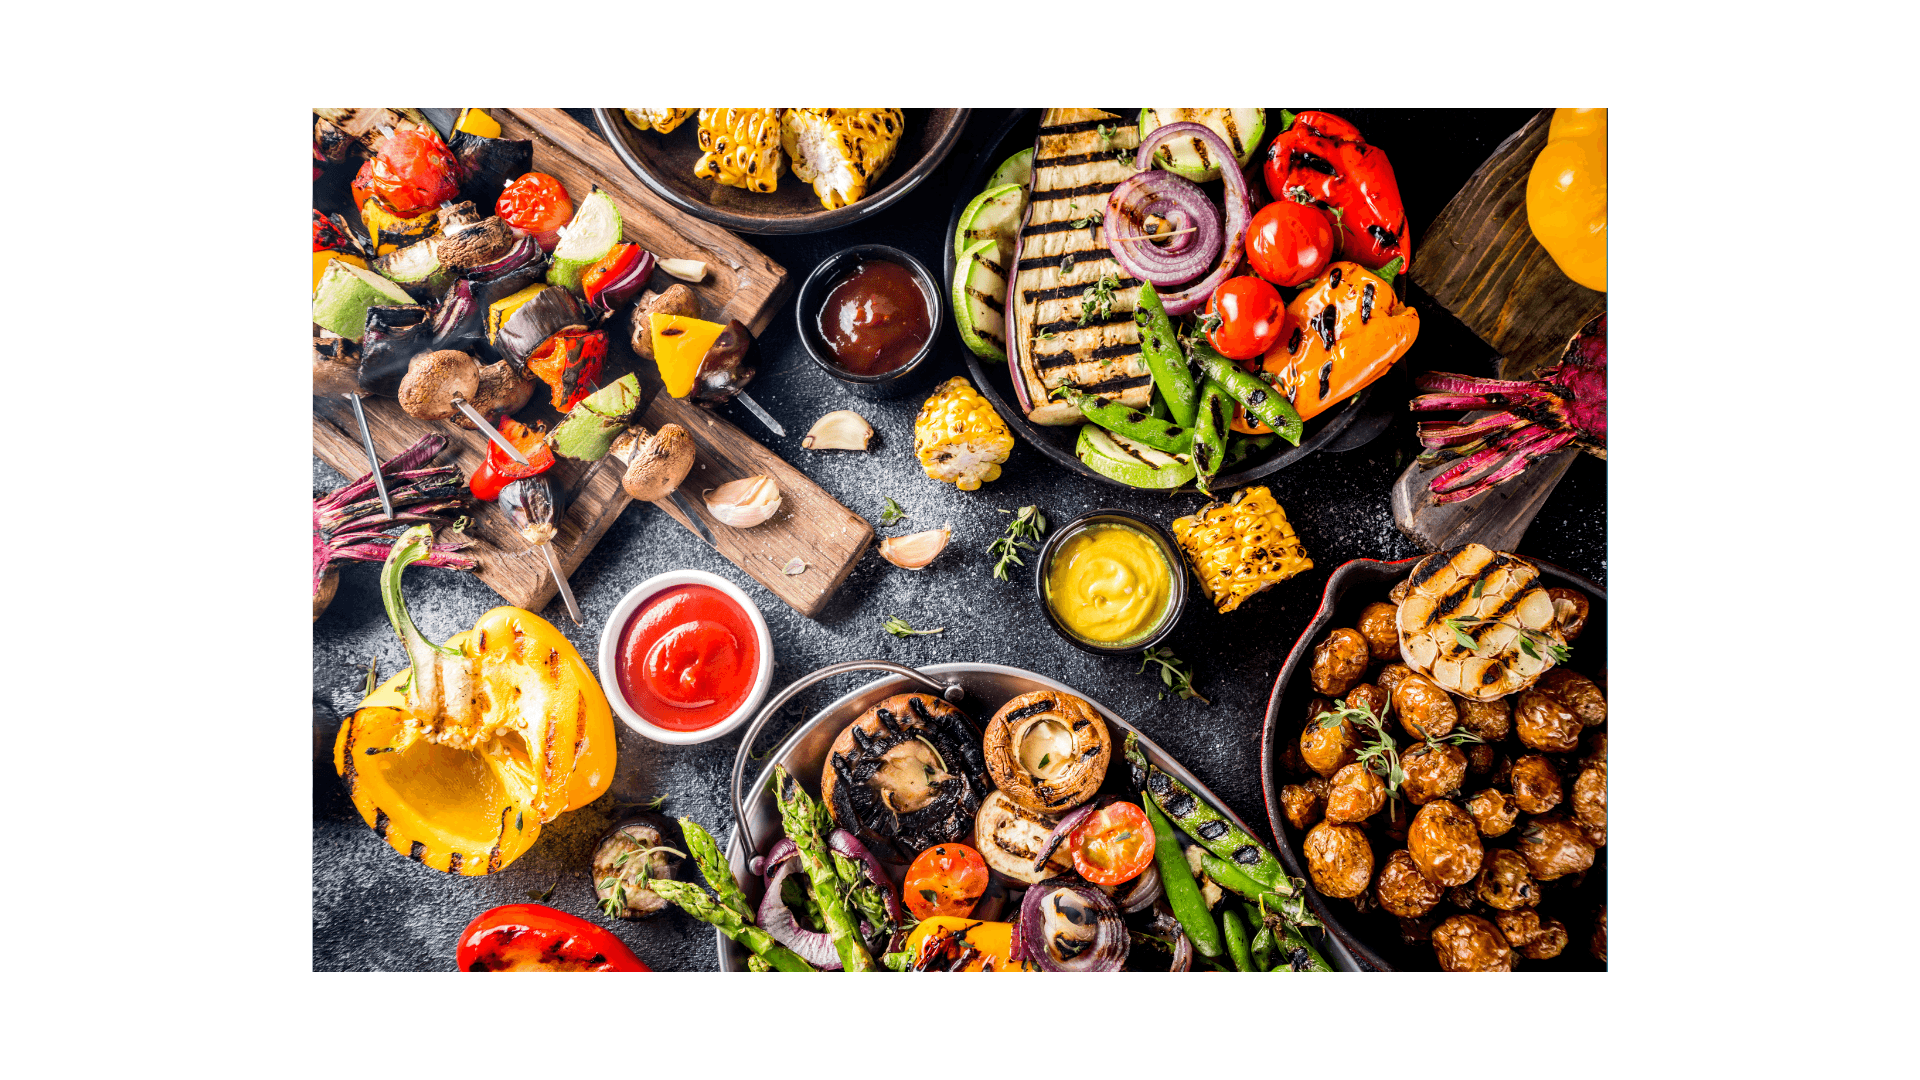 The Best Vegan BBQ Recipes for Summer